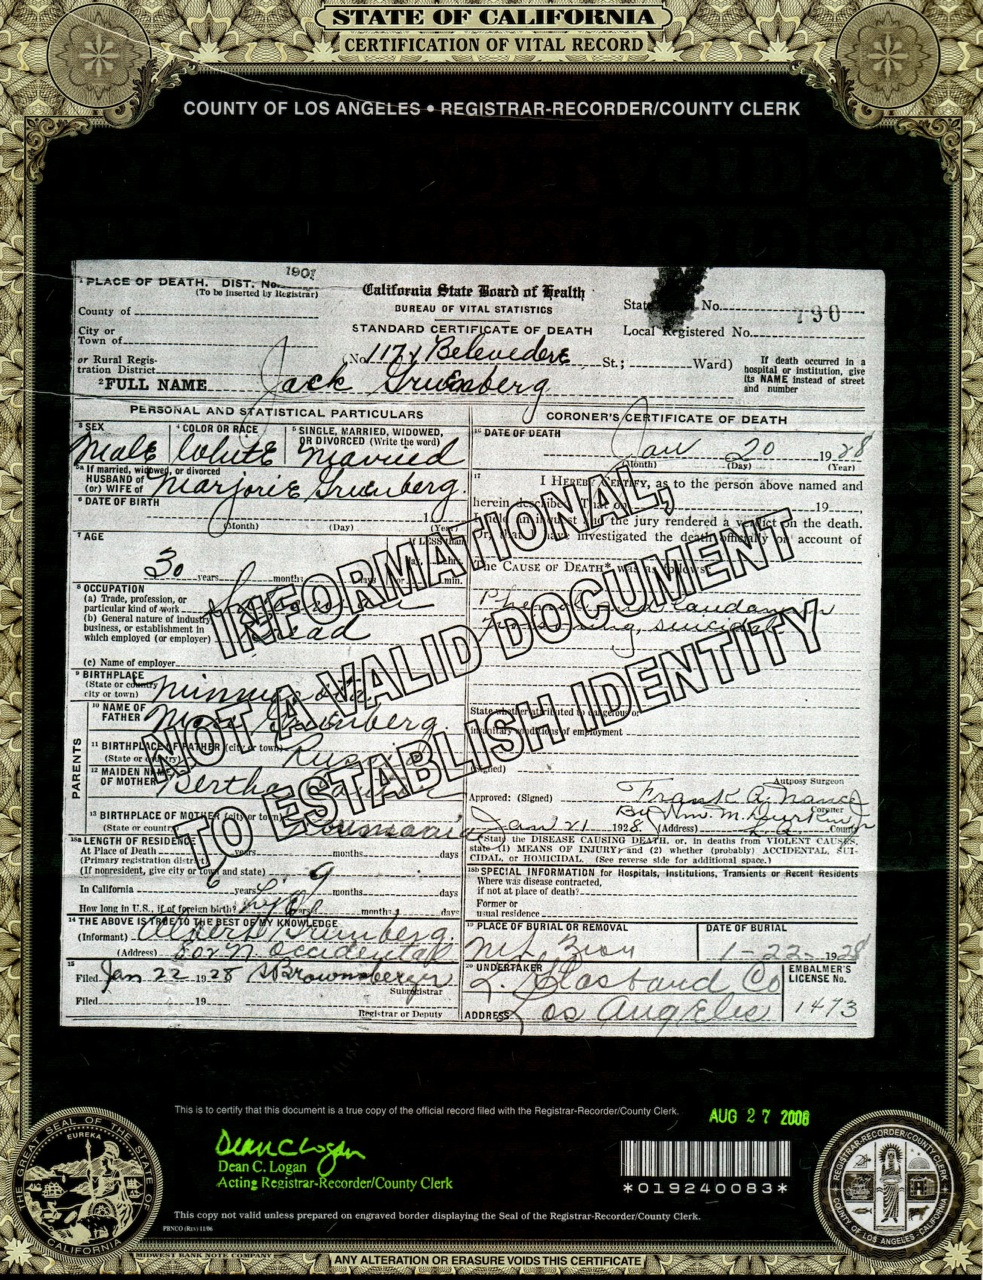 Death Certificate Jack Gruenberg02.jpg